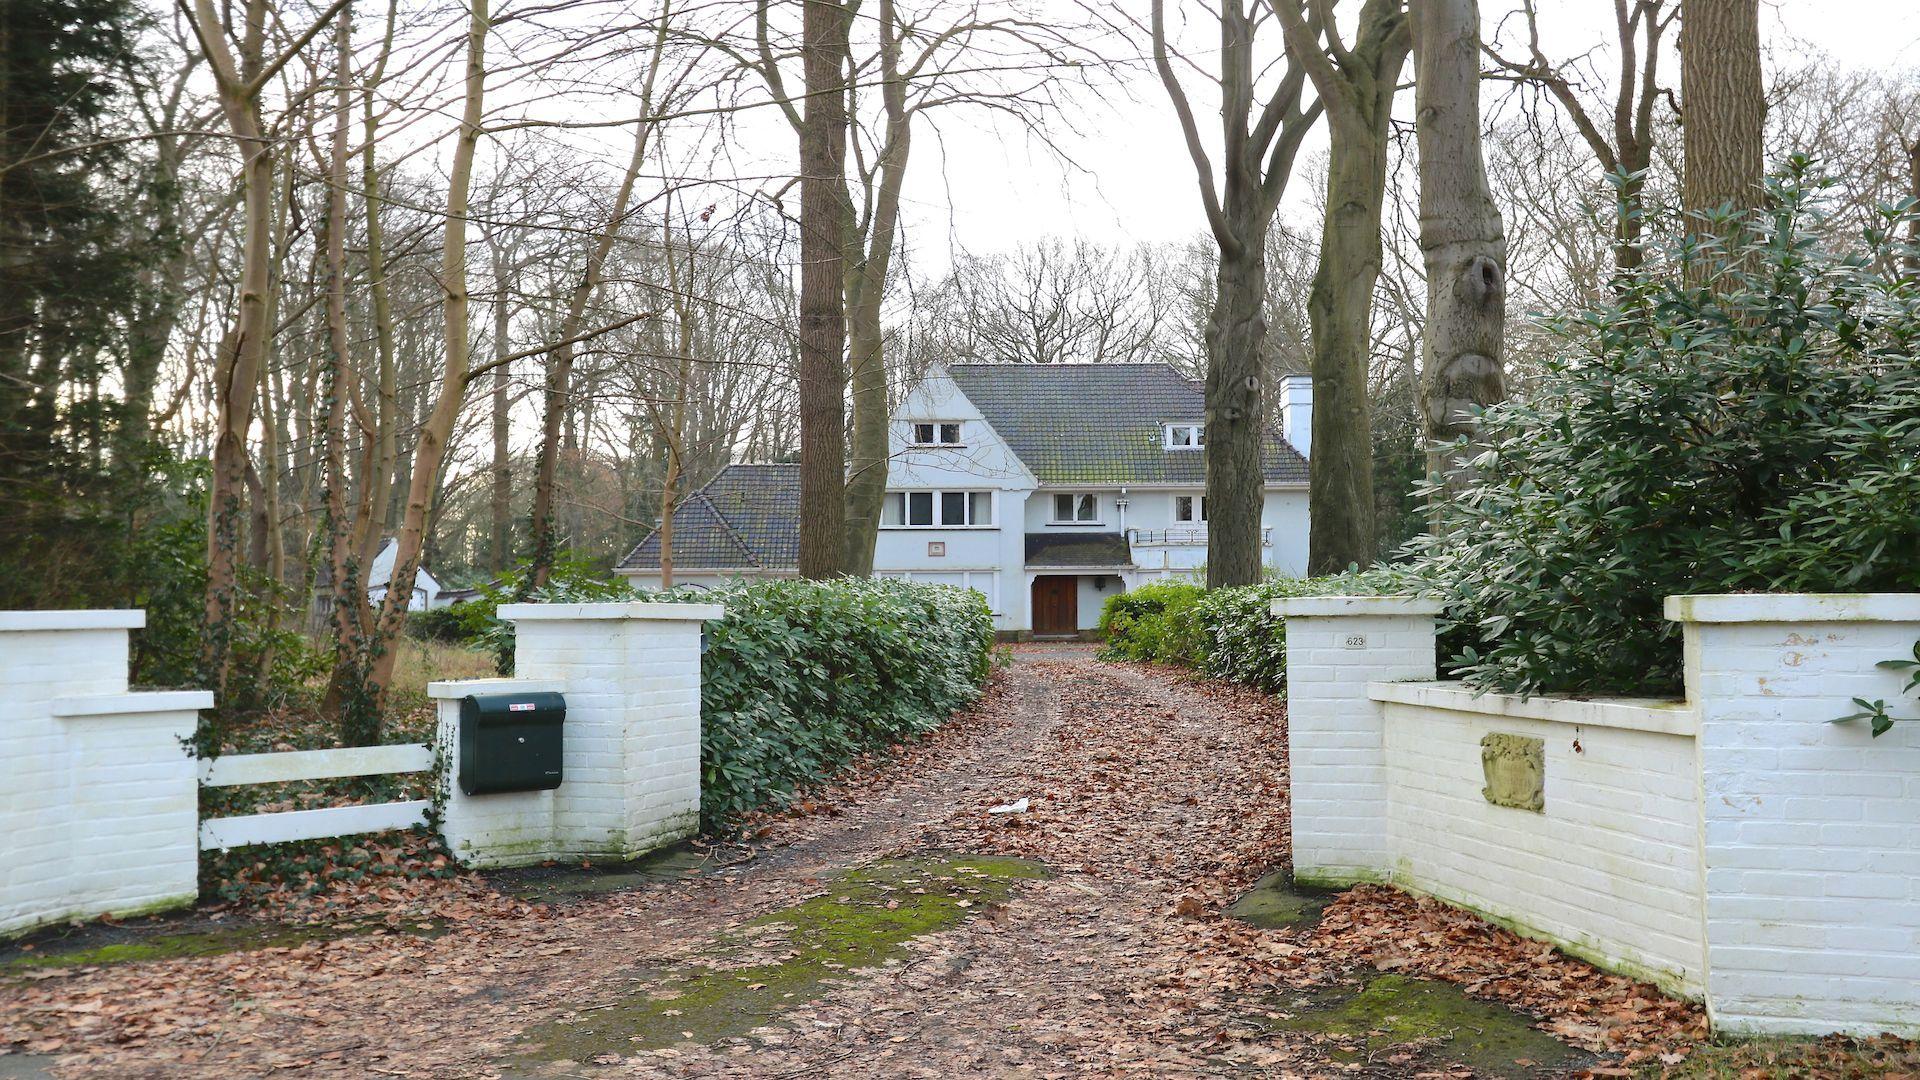 Landhuis 'Eickenbosch', charmepand uit de late jaren 30, uiterst residentiële ligging te St Andries, domein van circa 11000 m2